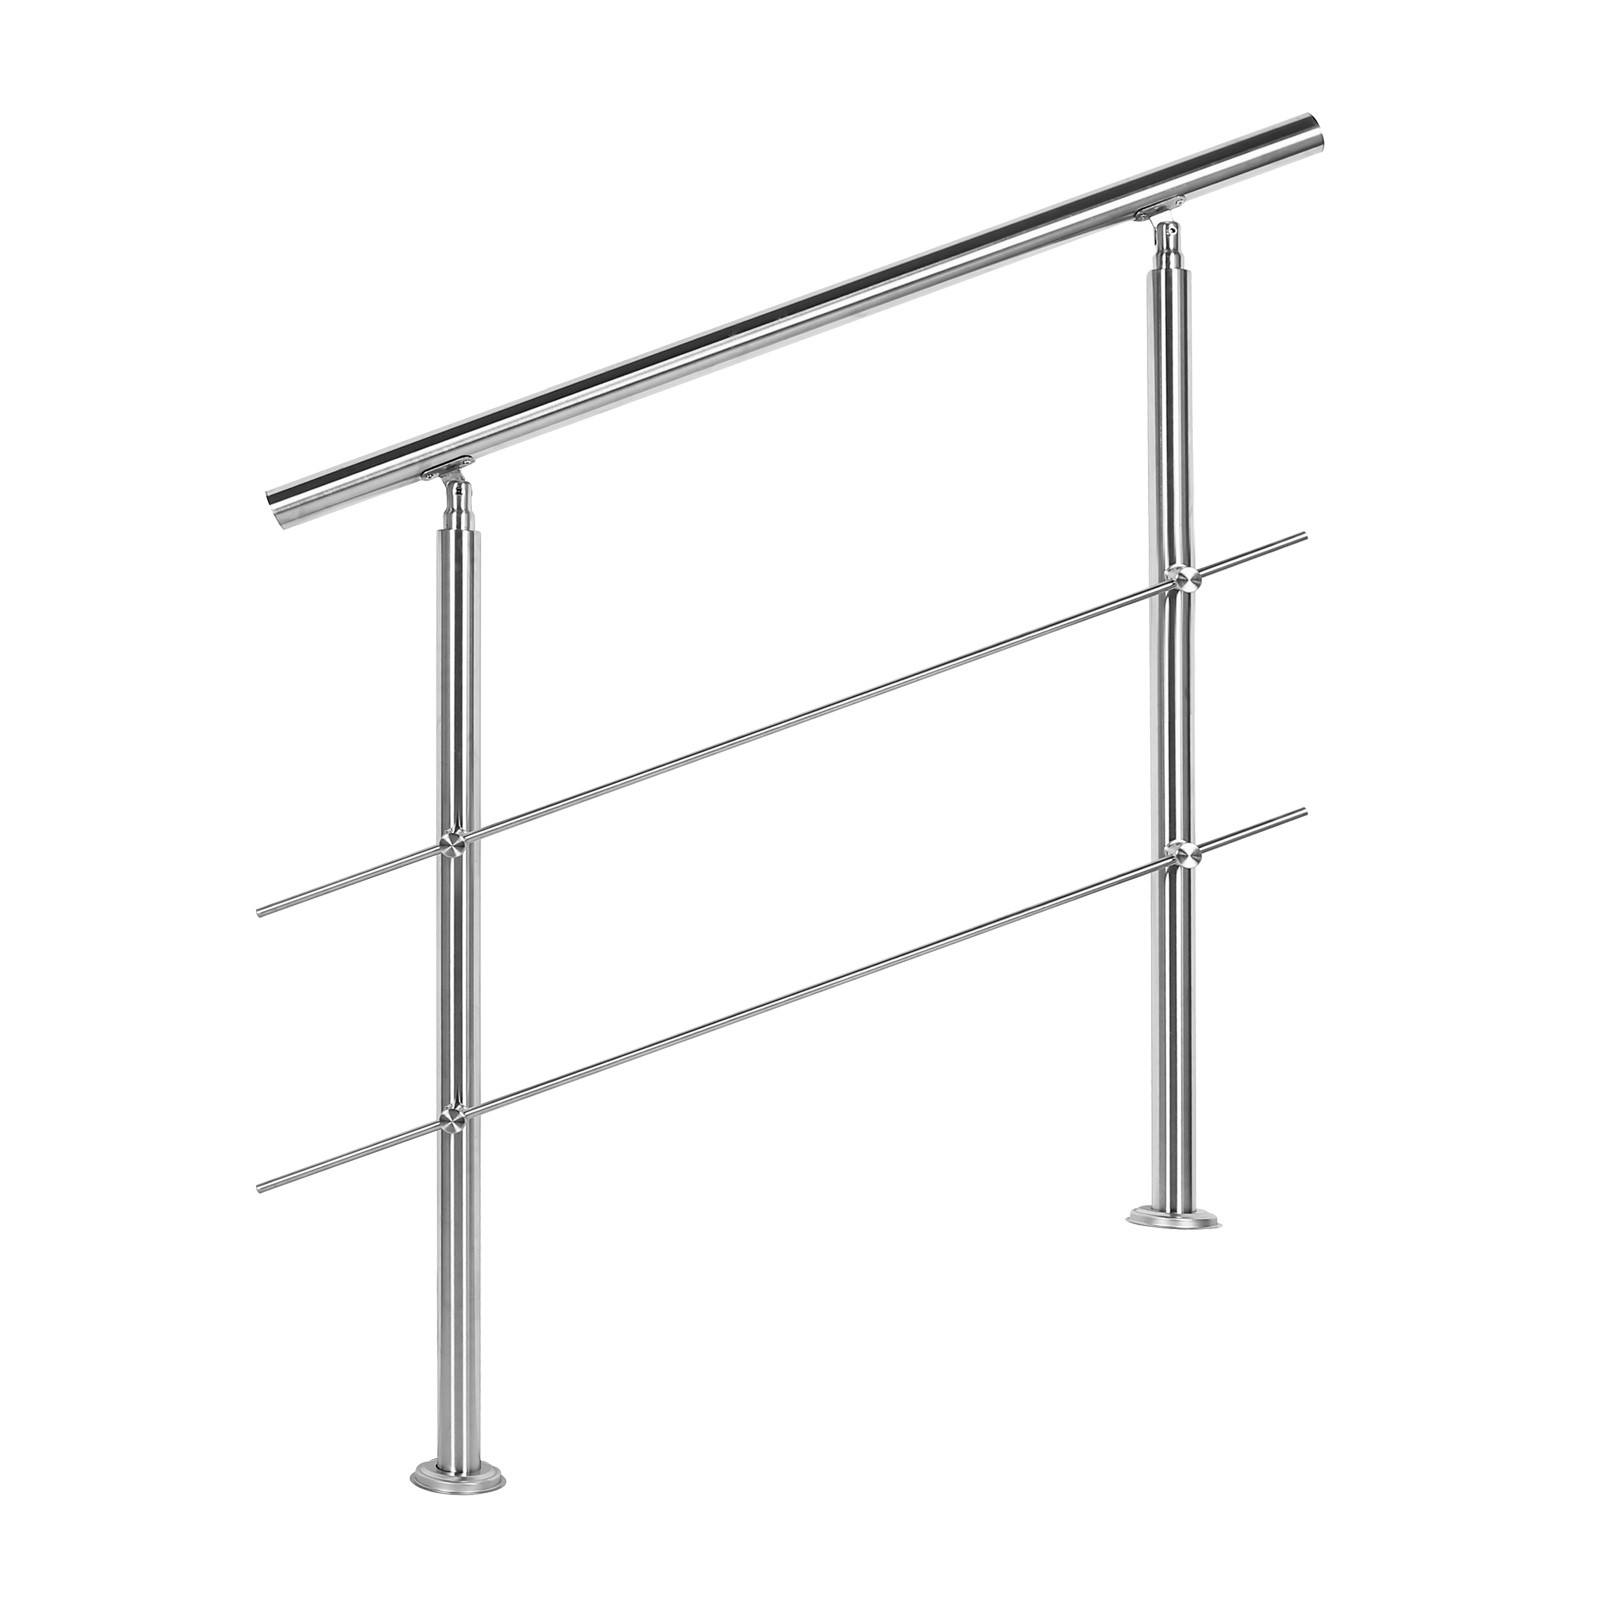 rampe d escalier acier inoxydable 2 tiges 100cm balustrade main courante ebay. Black Bedroom Furniture Sets. Home Design Ideas